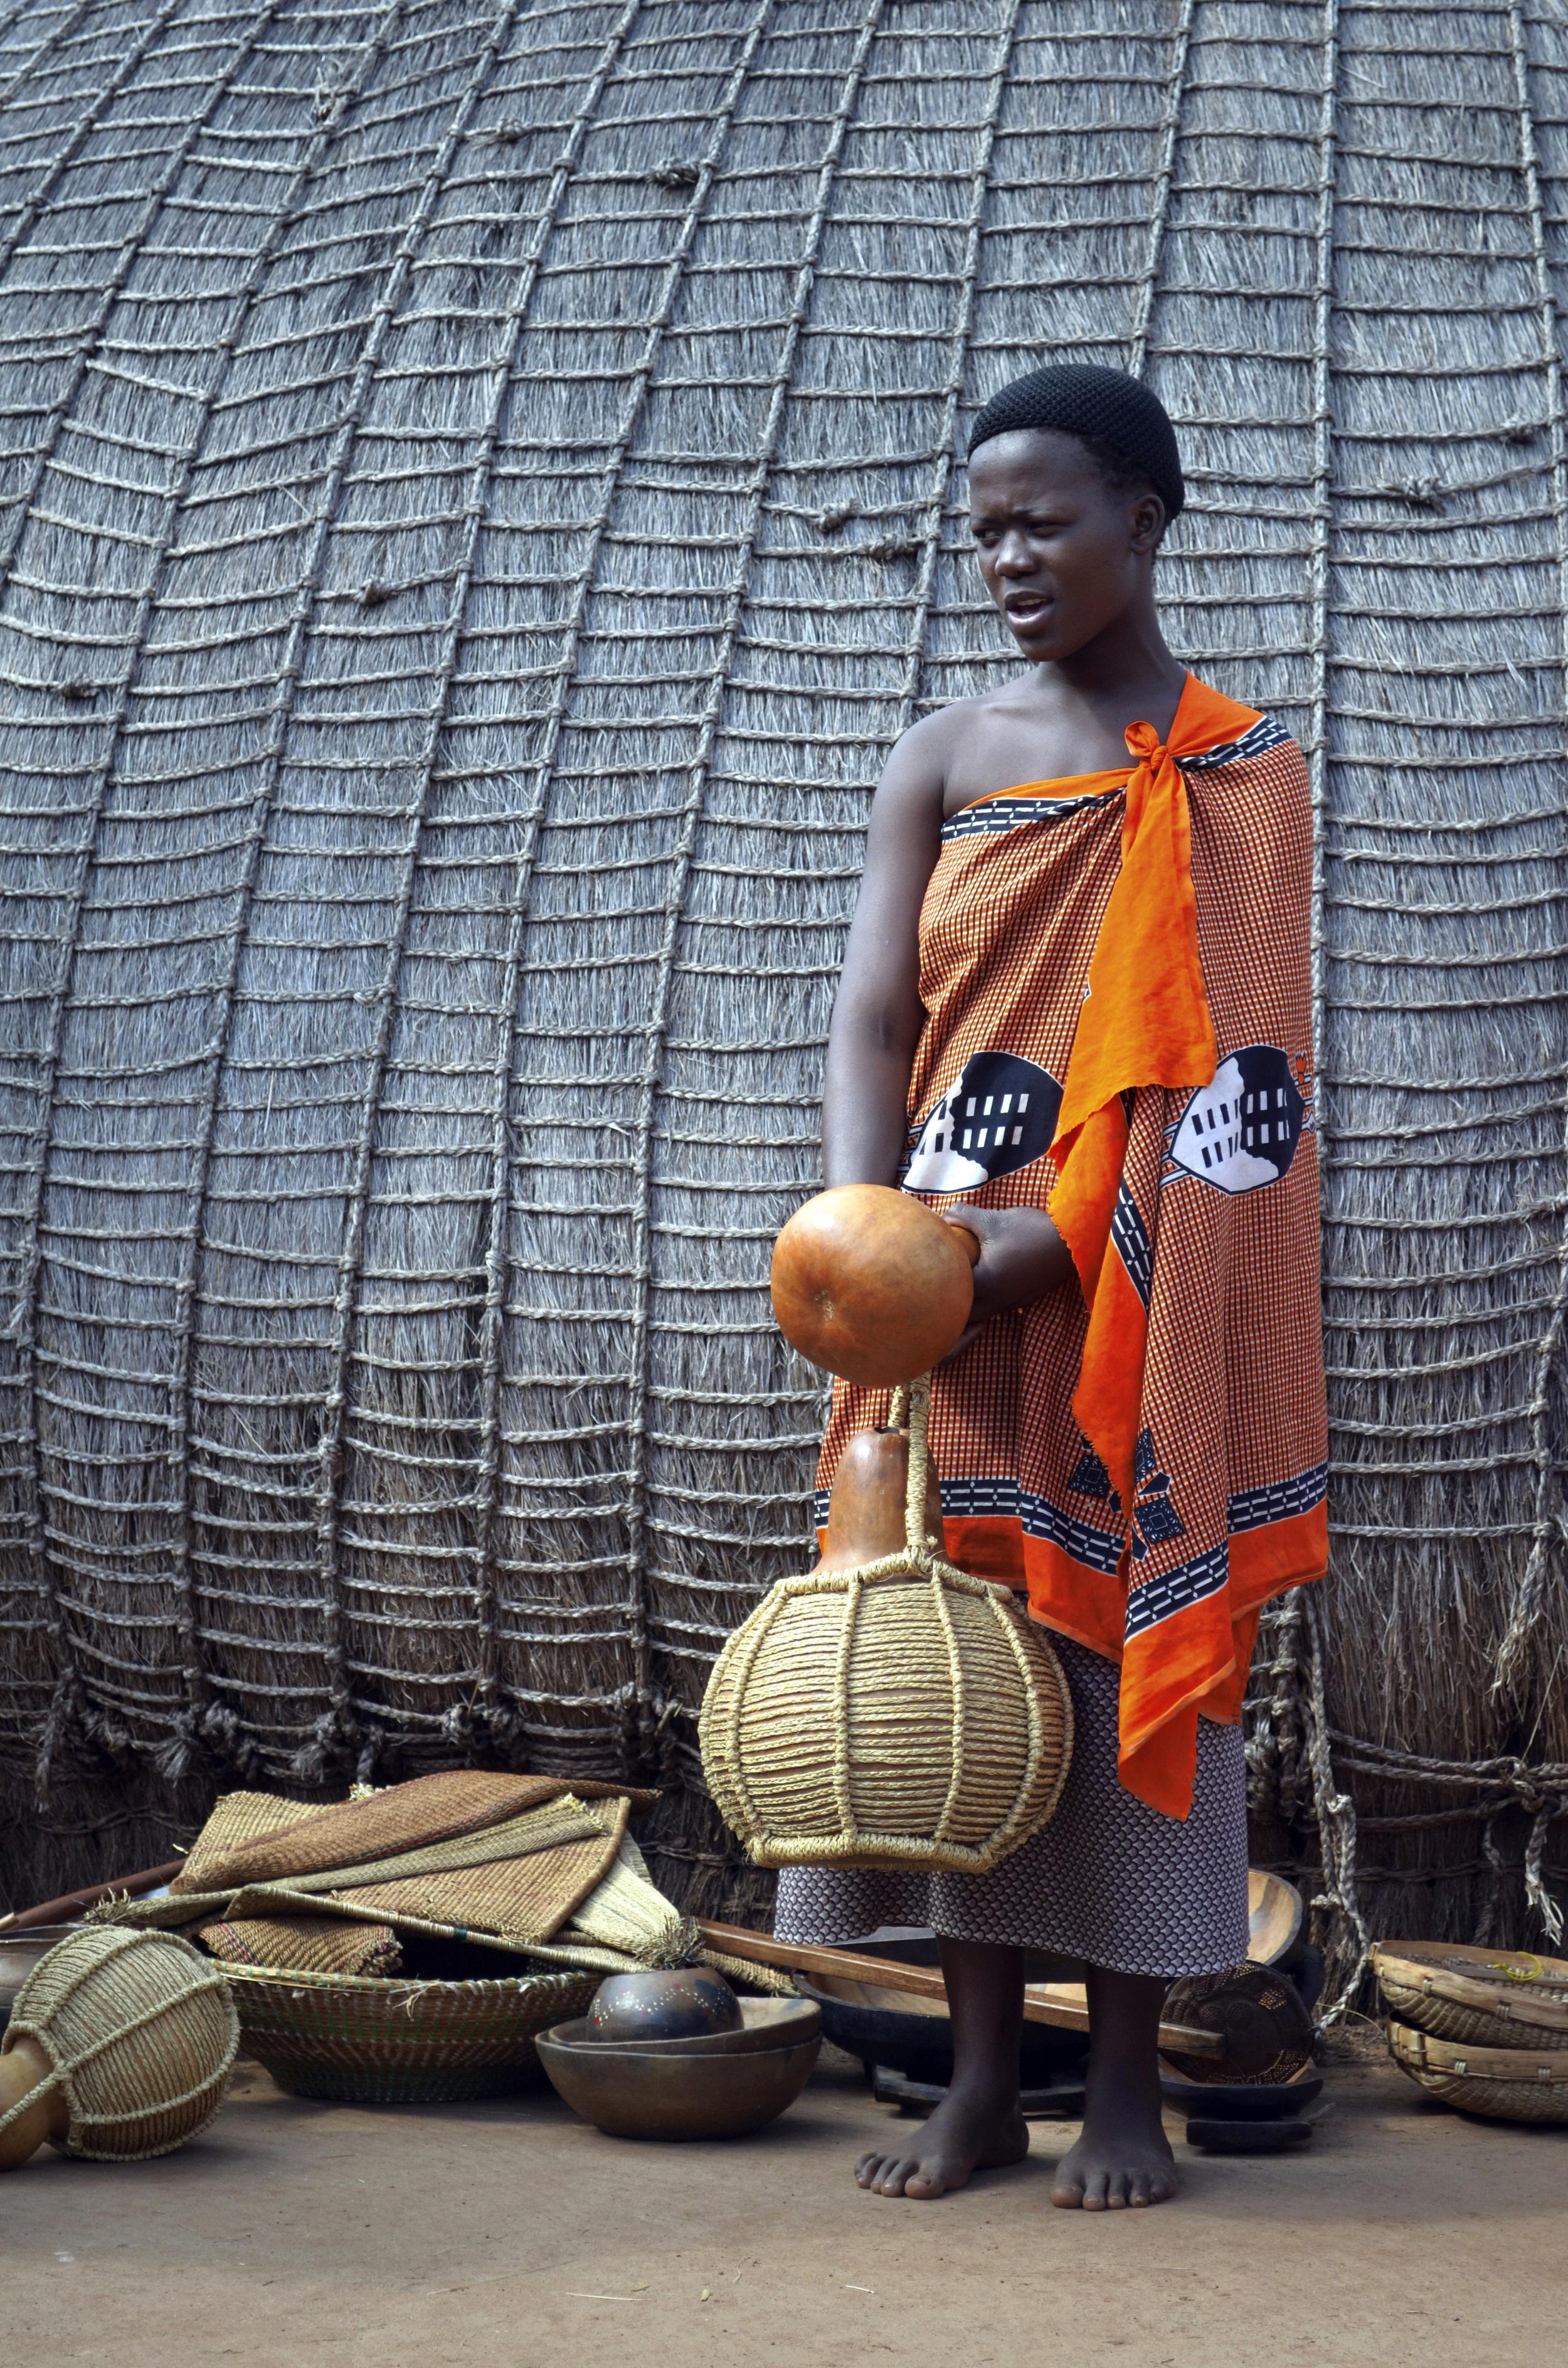 African Villager.jpg